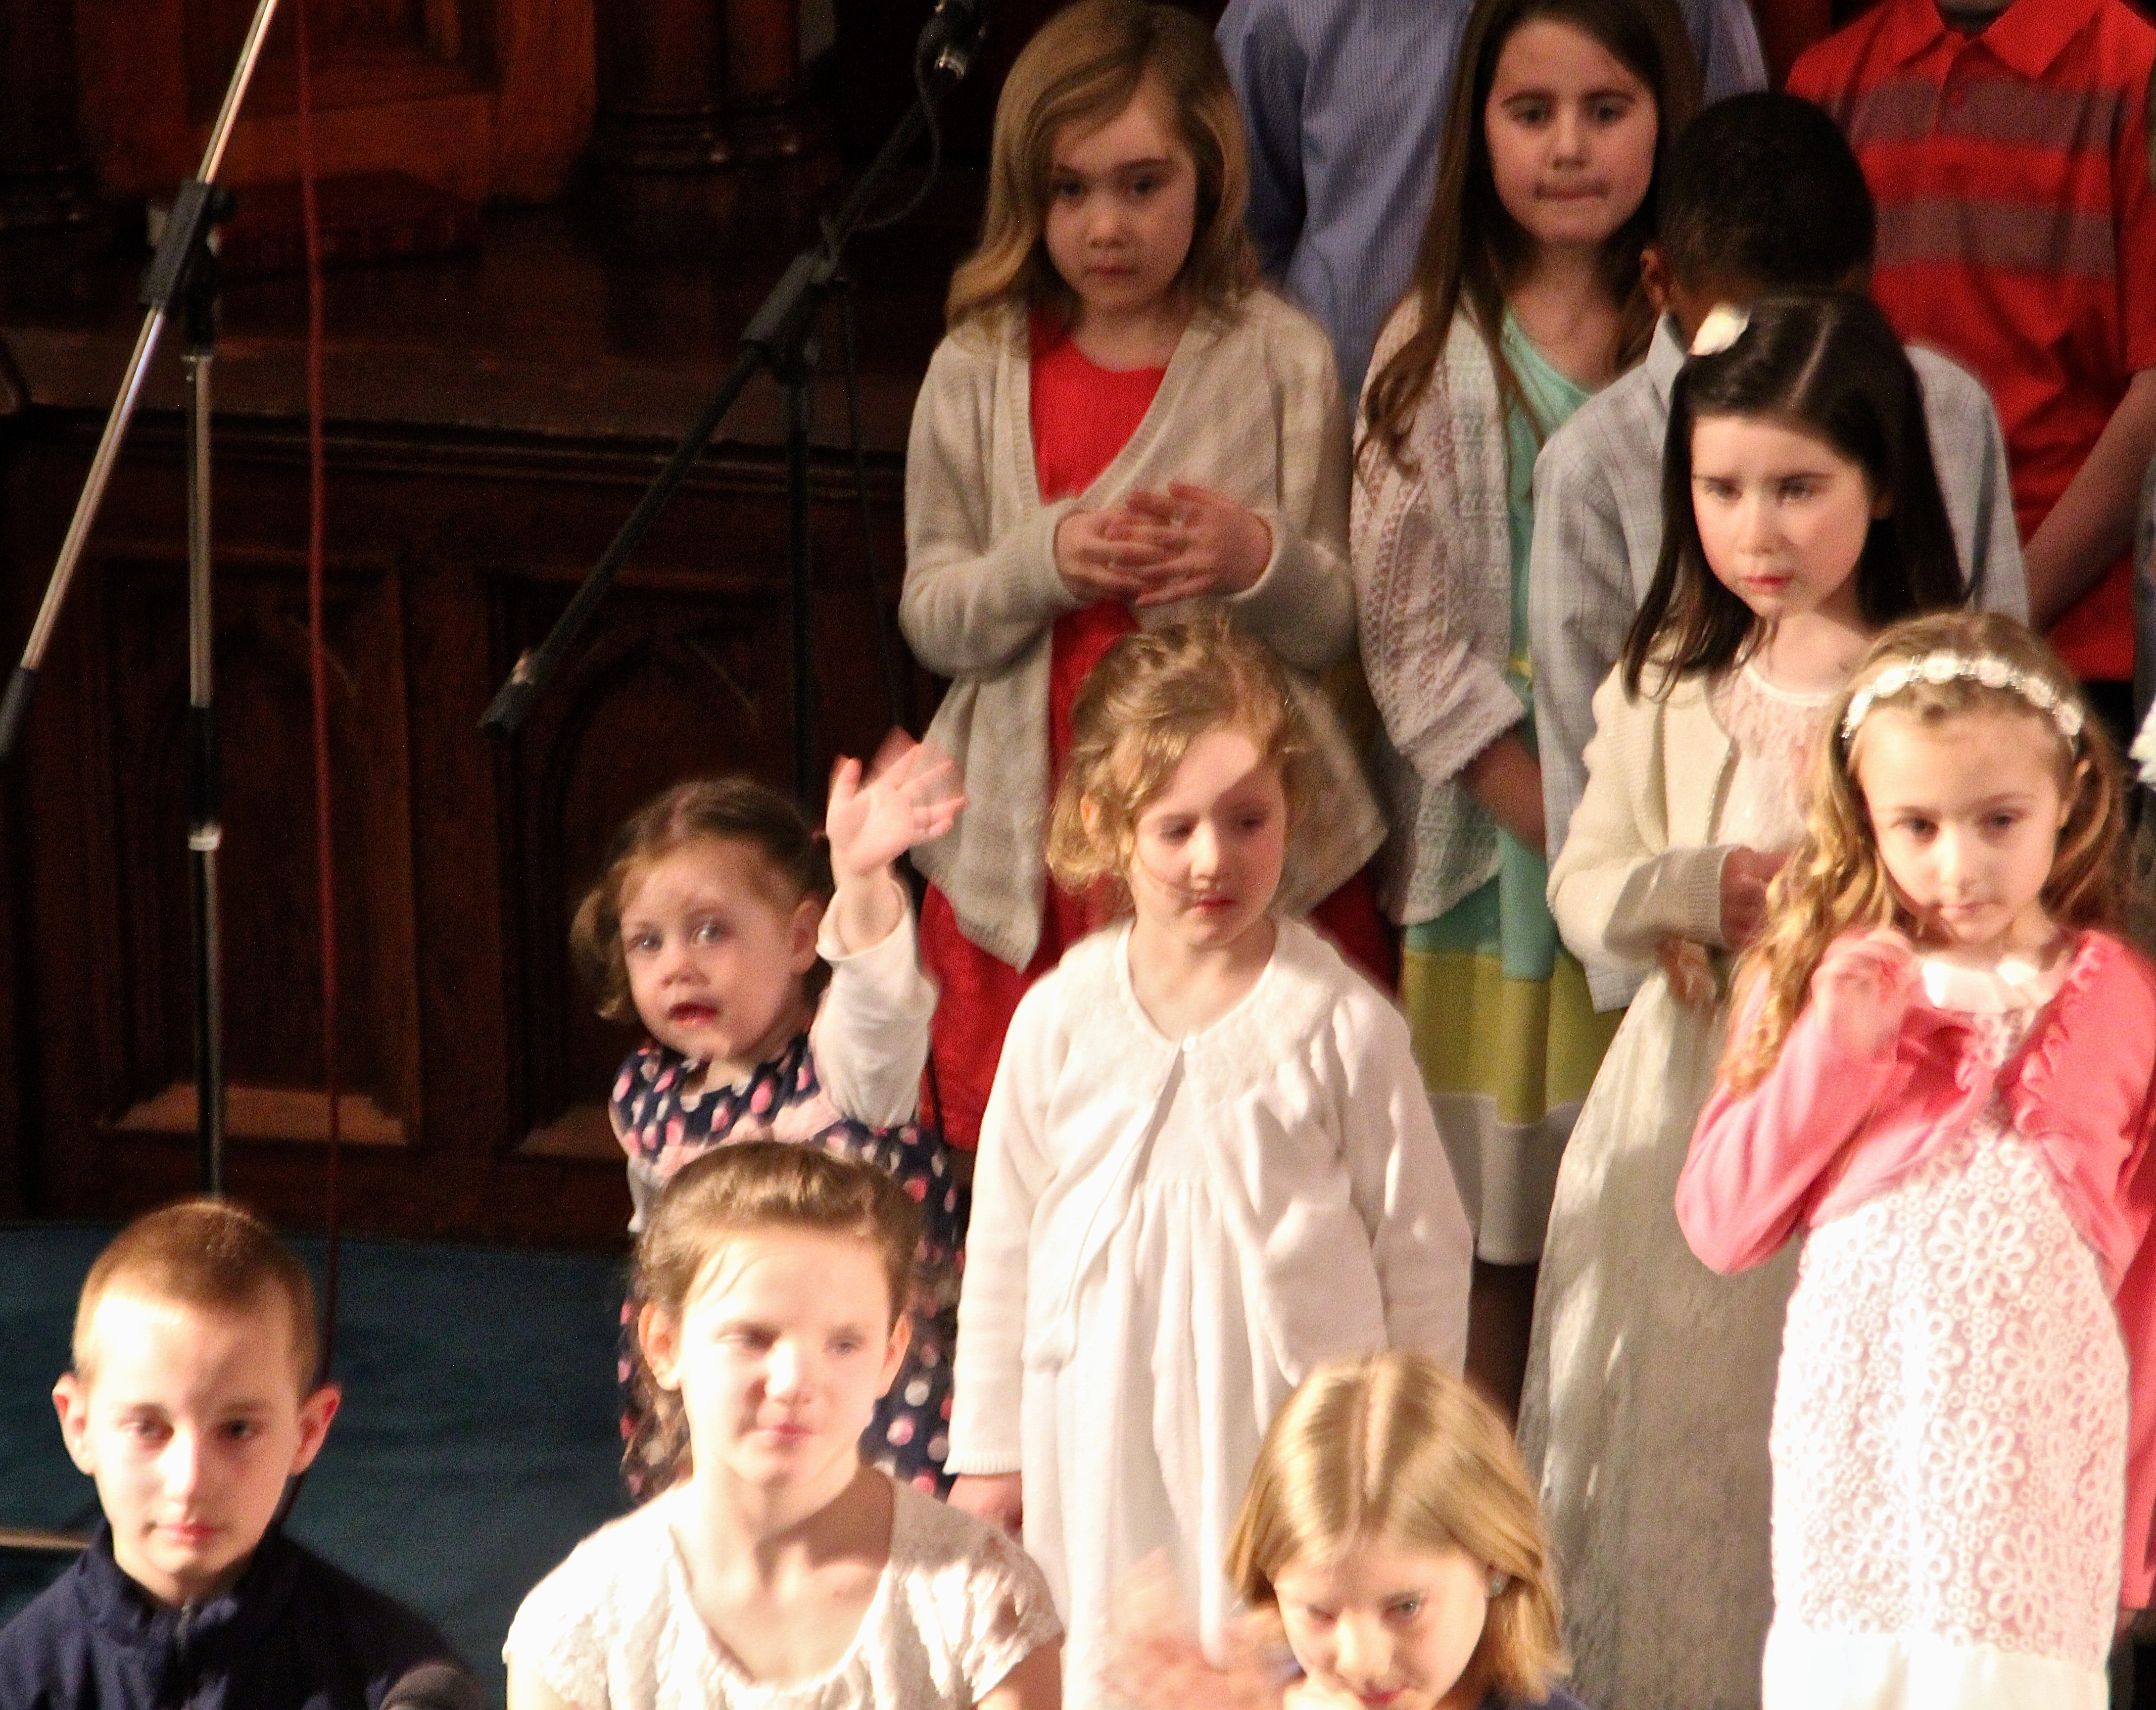 Children singing in church on Easter Morning